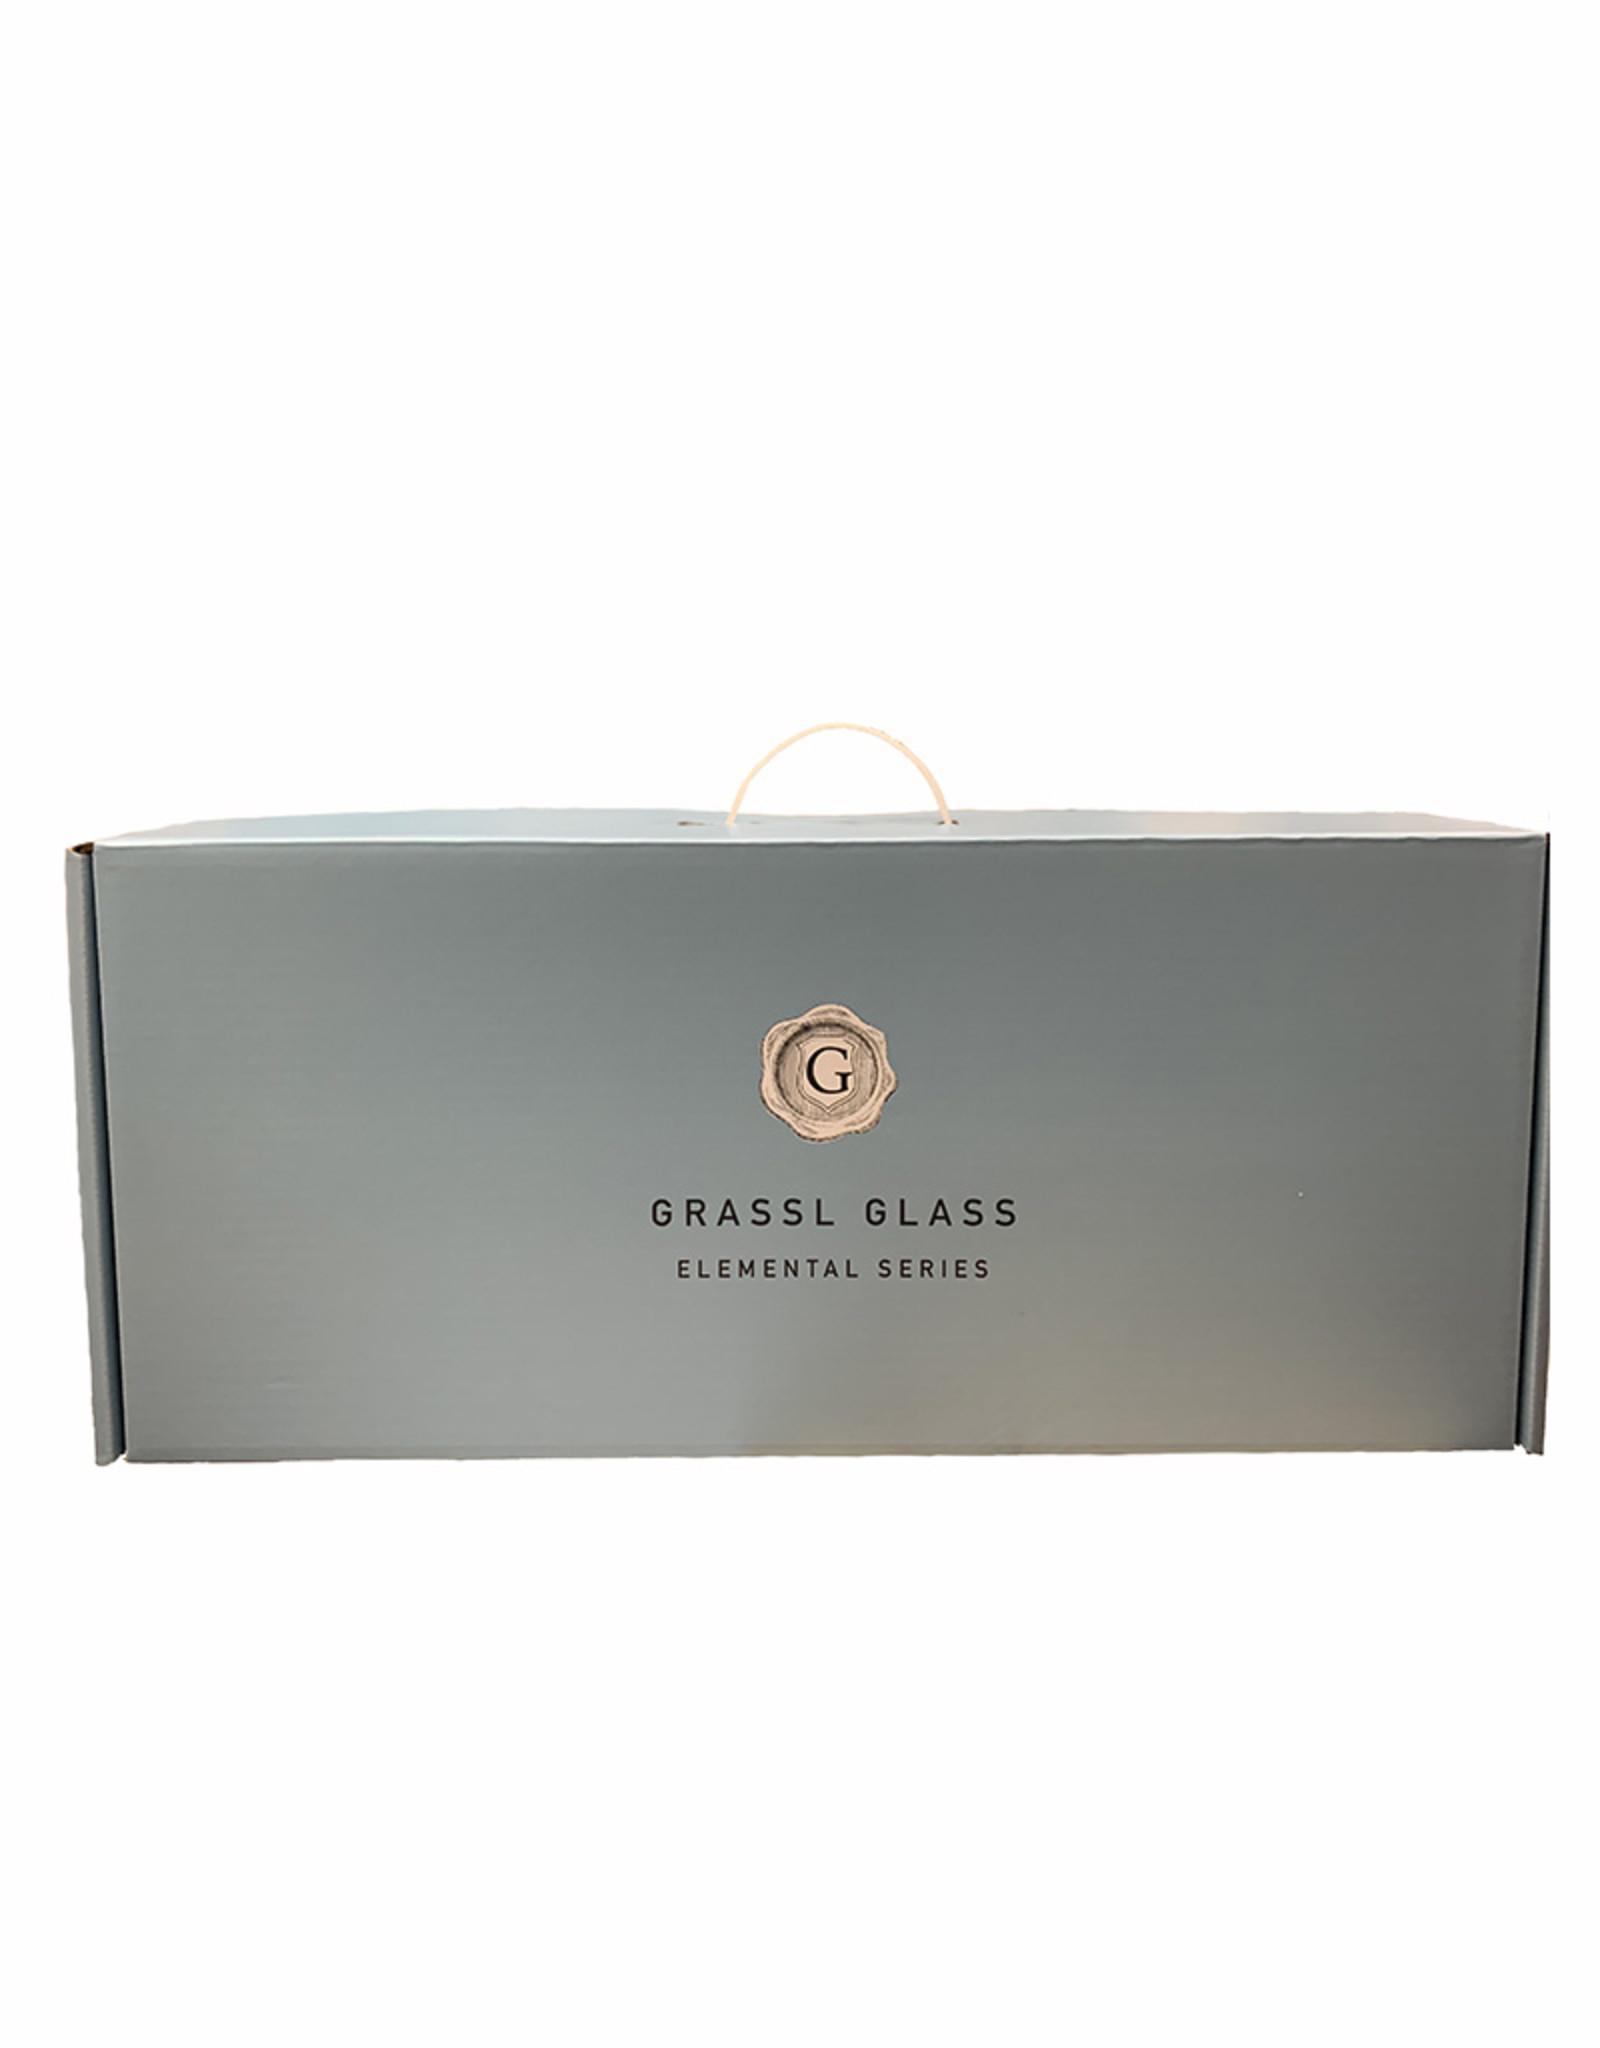 Grassl Elemental Series Gift Box